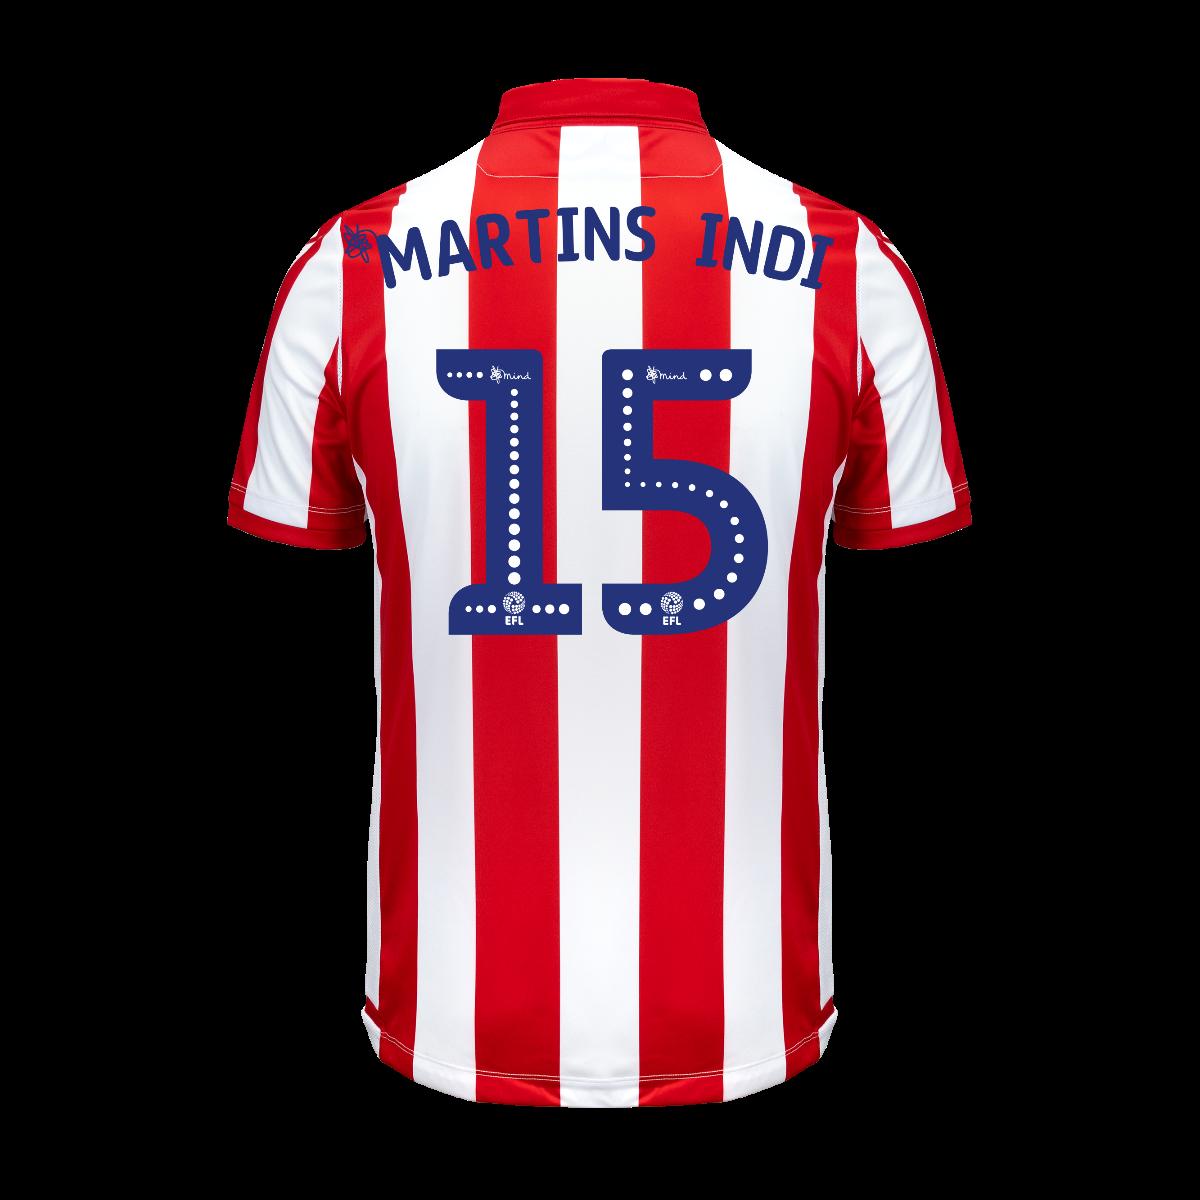 2019/20 Junior Home SS Shirt - Martins Indi